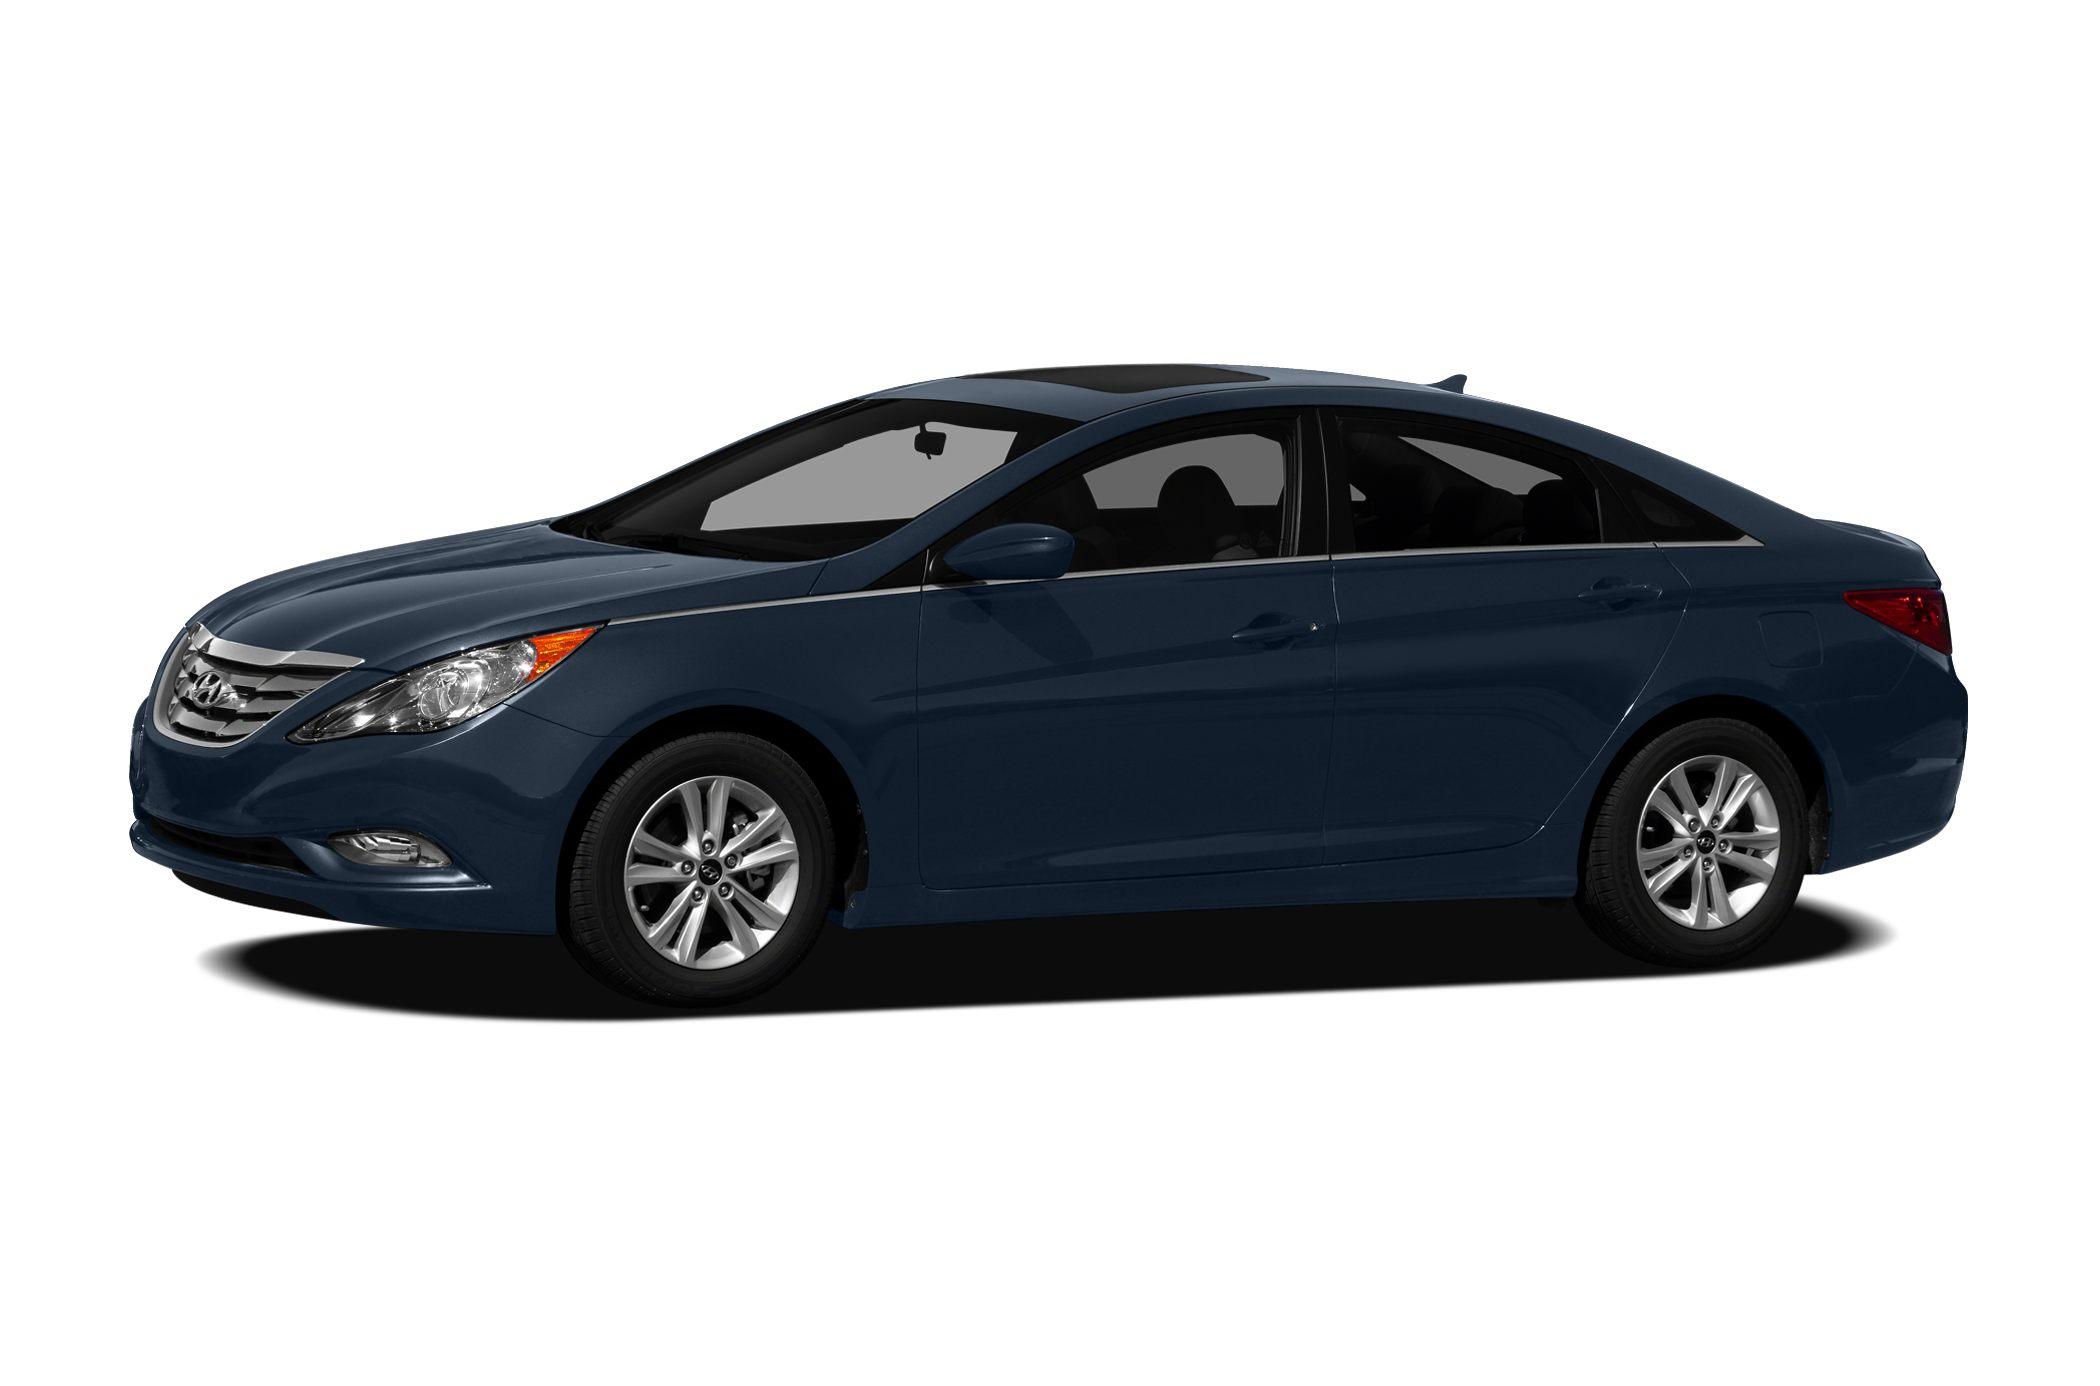 2012 Hyundai Sonata GLS New Price Red 2012 Hyundai Sonata FWD 6-Speed Automatic with Shiftronic 2